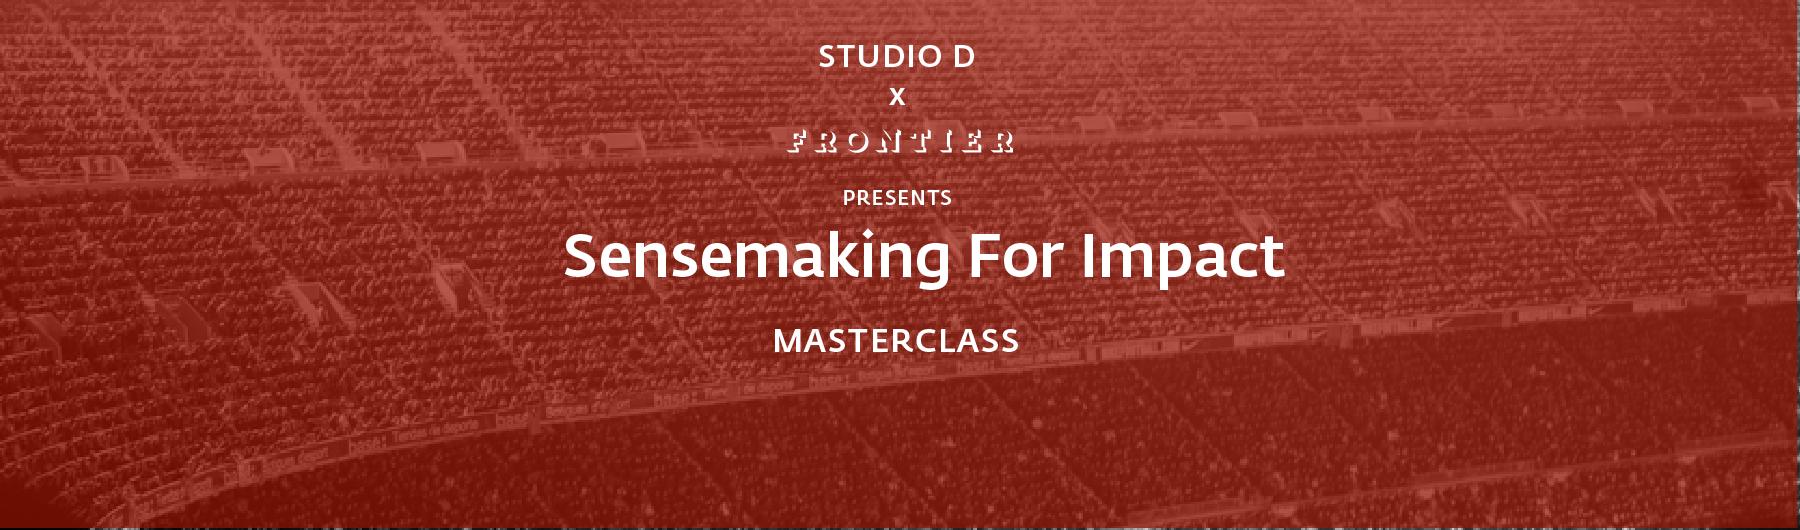 Sensemaking For Impact Masterclass, 31 March 2020, Toronto